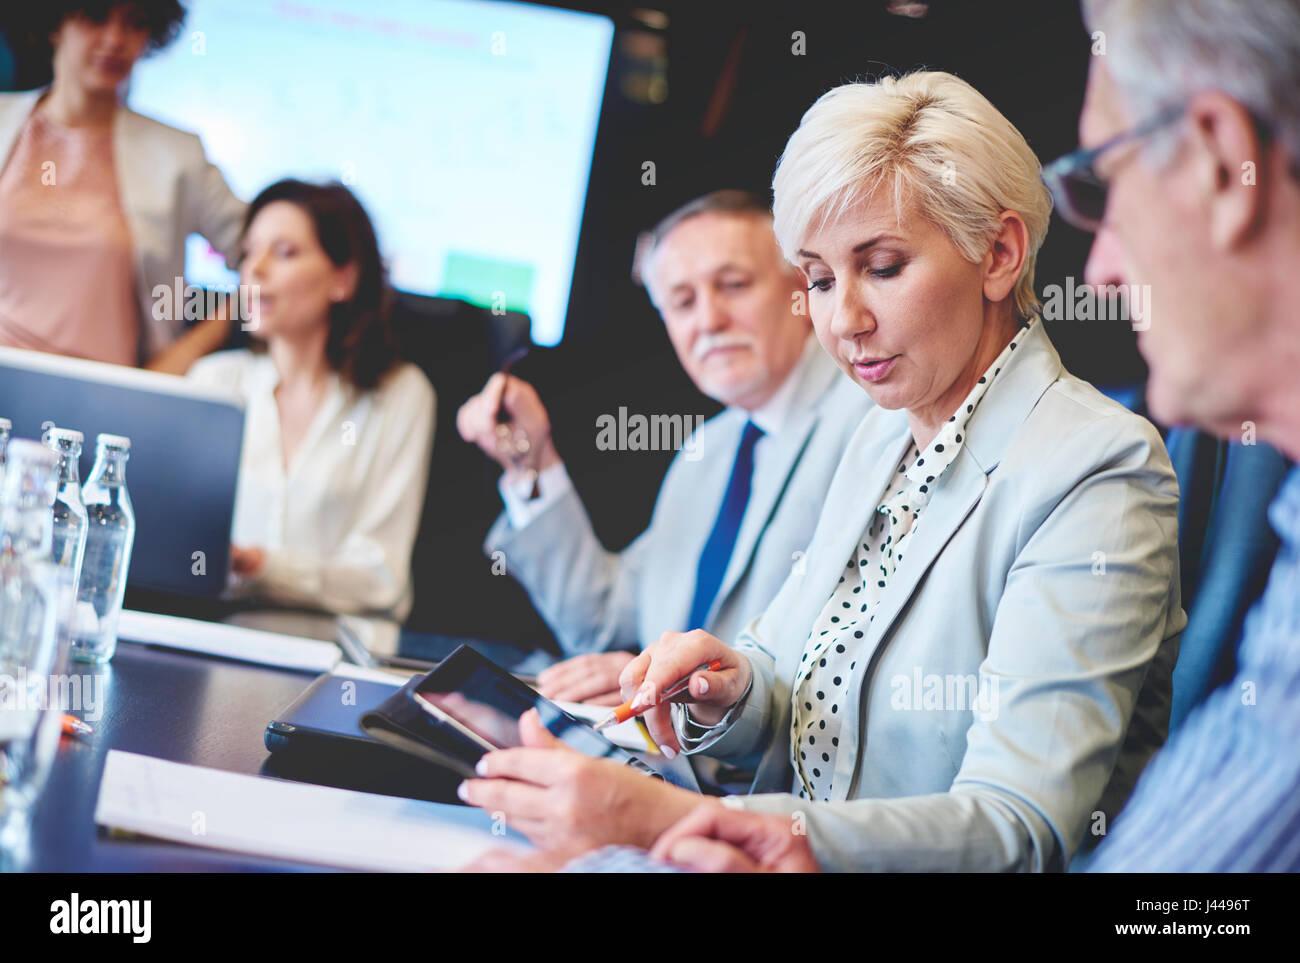 Business people using wireless technology - Stock Image